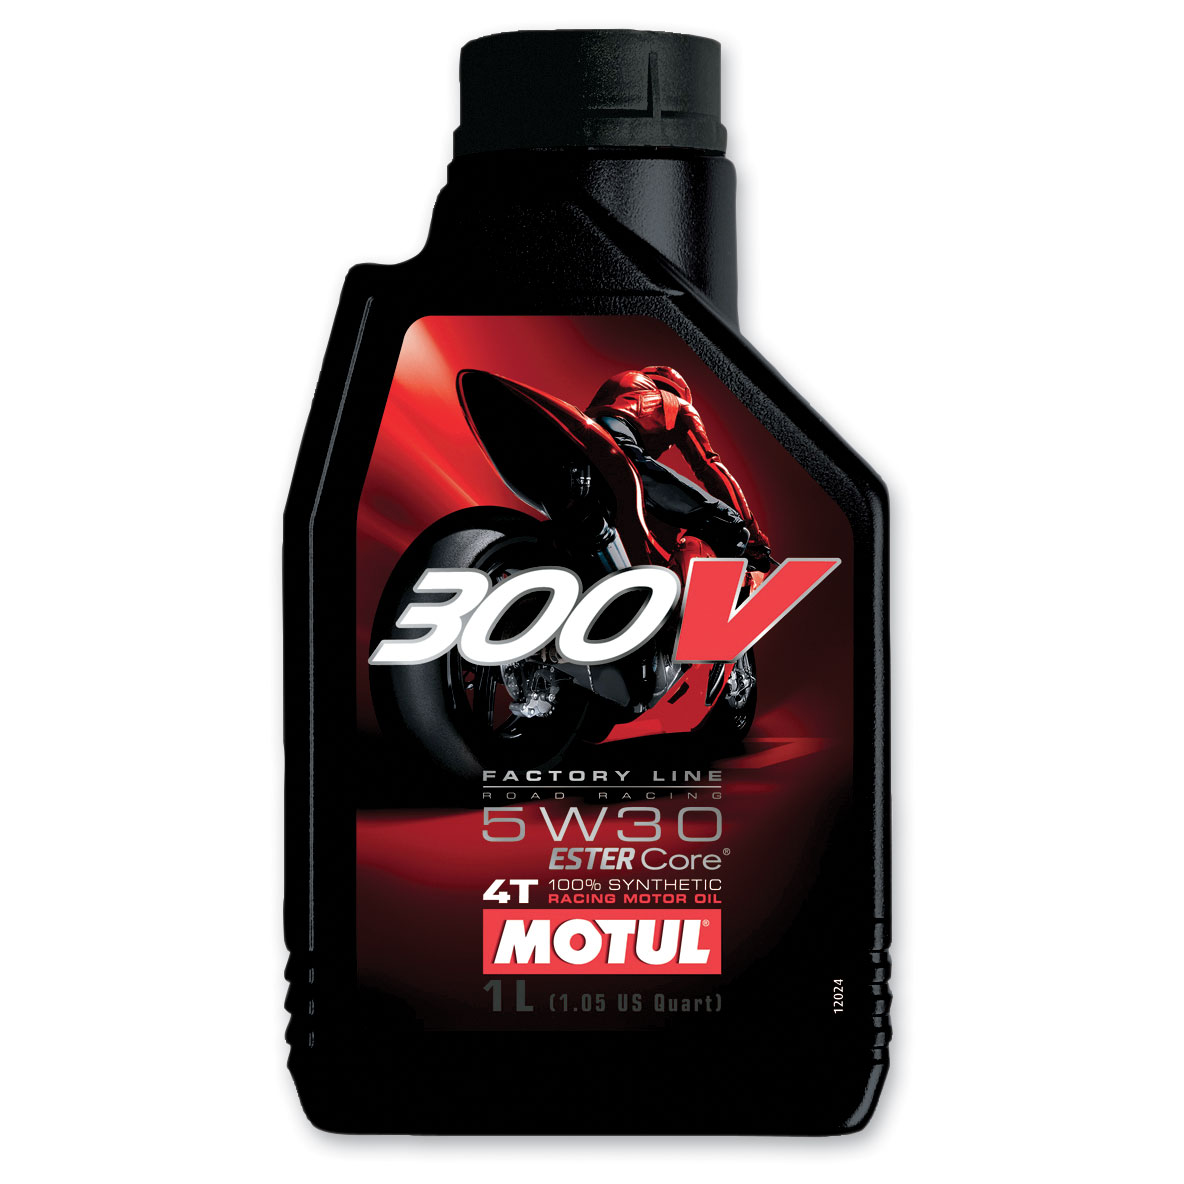 Motul 300V Factory Line 4T 5w30 100 percent synthetic Estercore 4-Stroke Motor Cycle 1 litre Two Wheeler Engine Oils